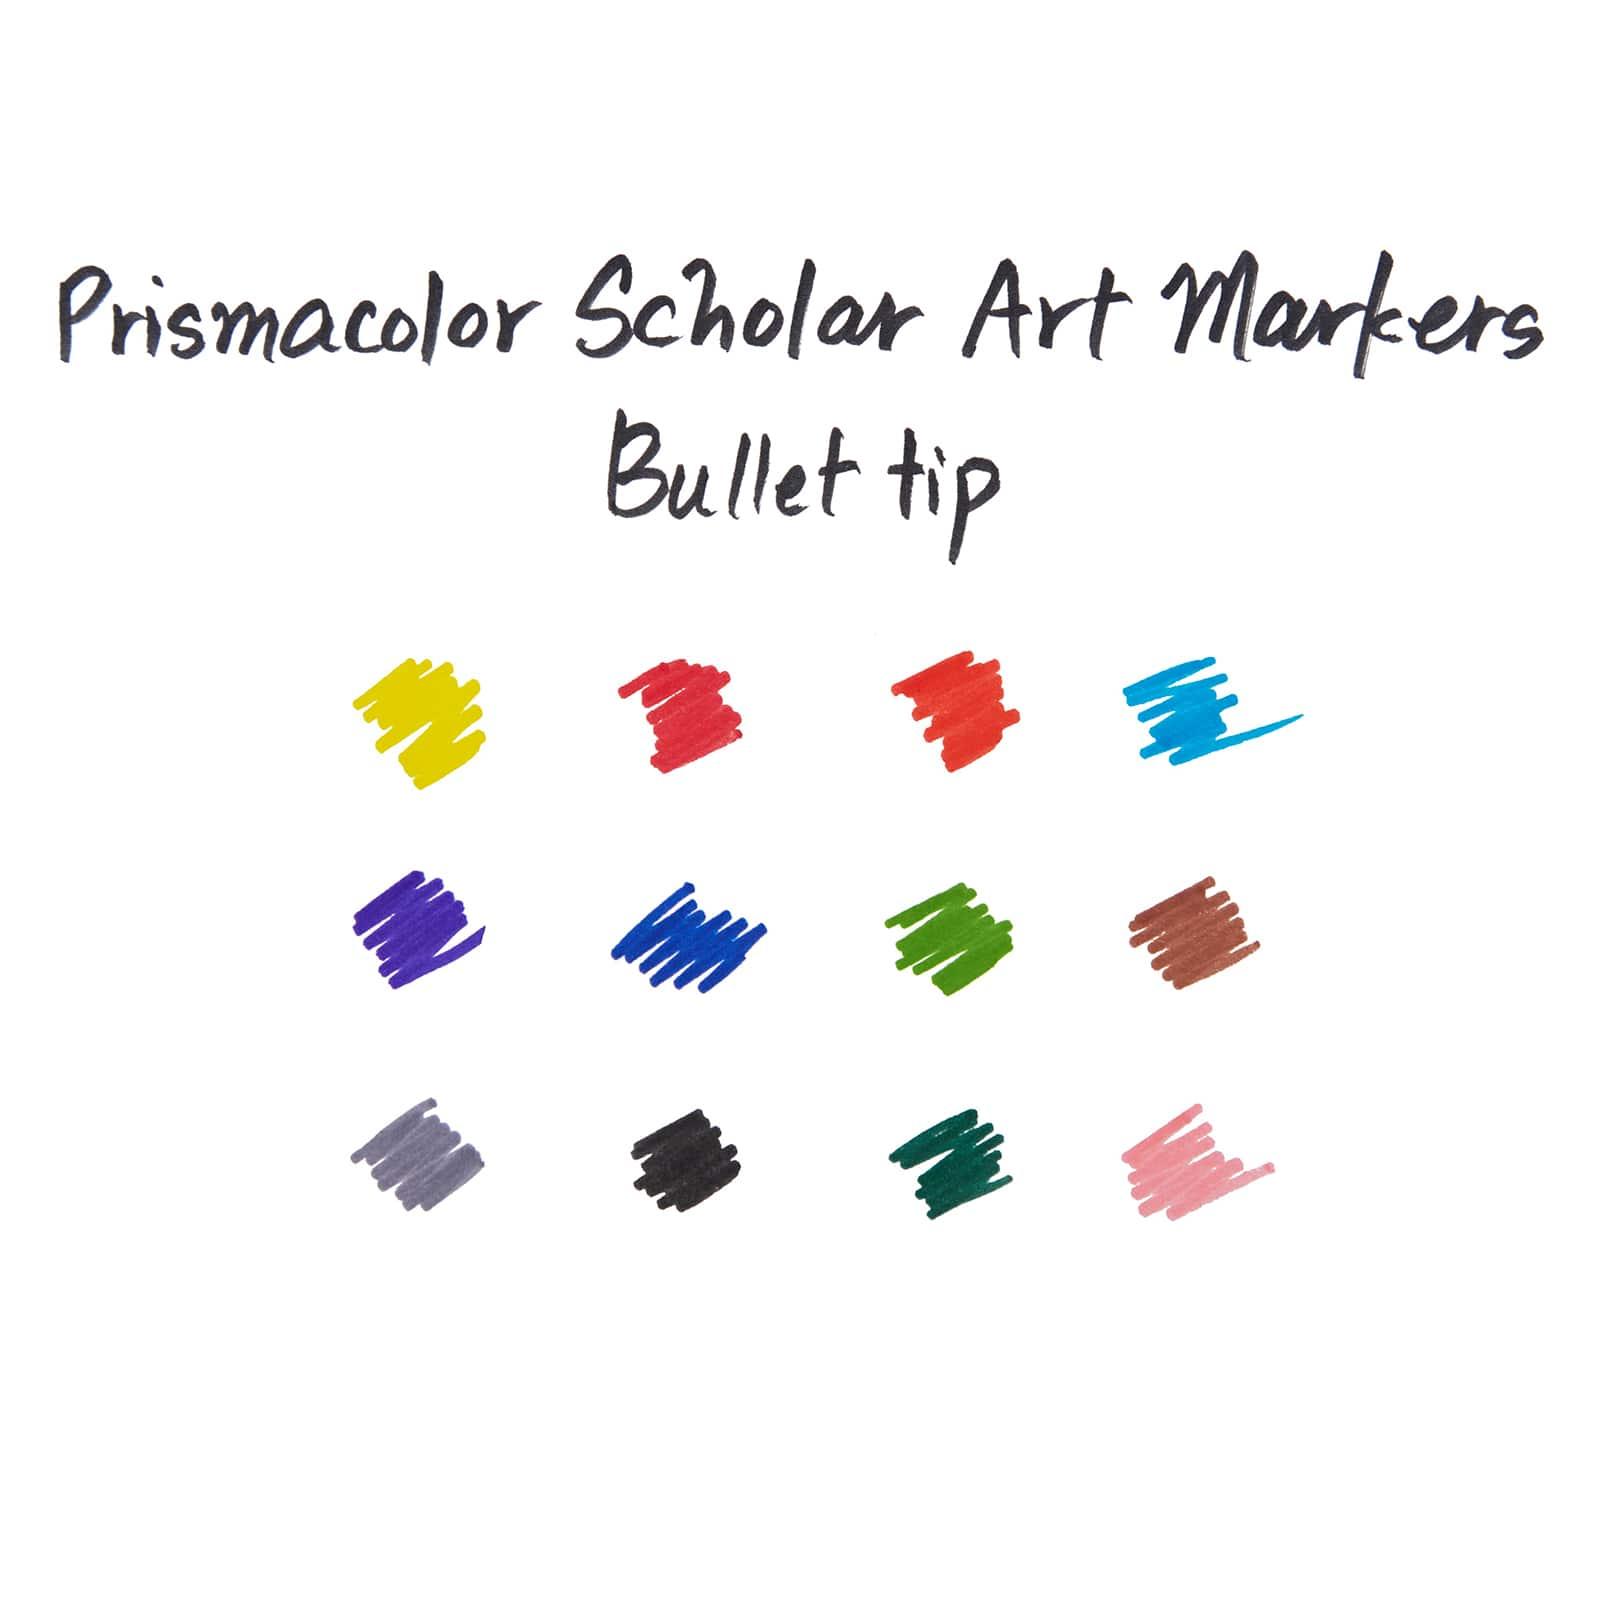 Prismacolor Scholar Bullet Tip Art Markers 10 Colors Water Based Low Odor Ink